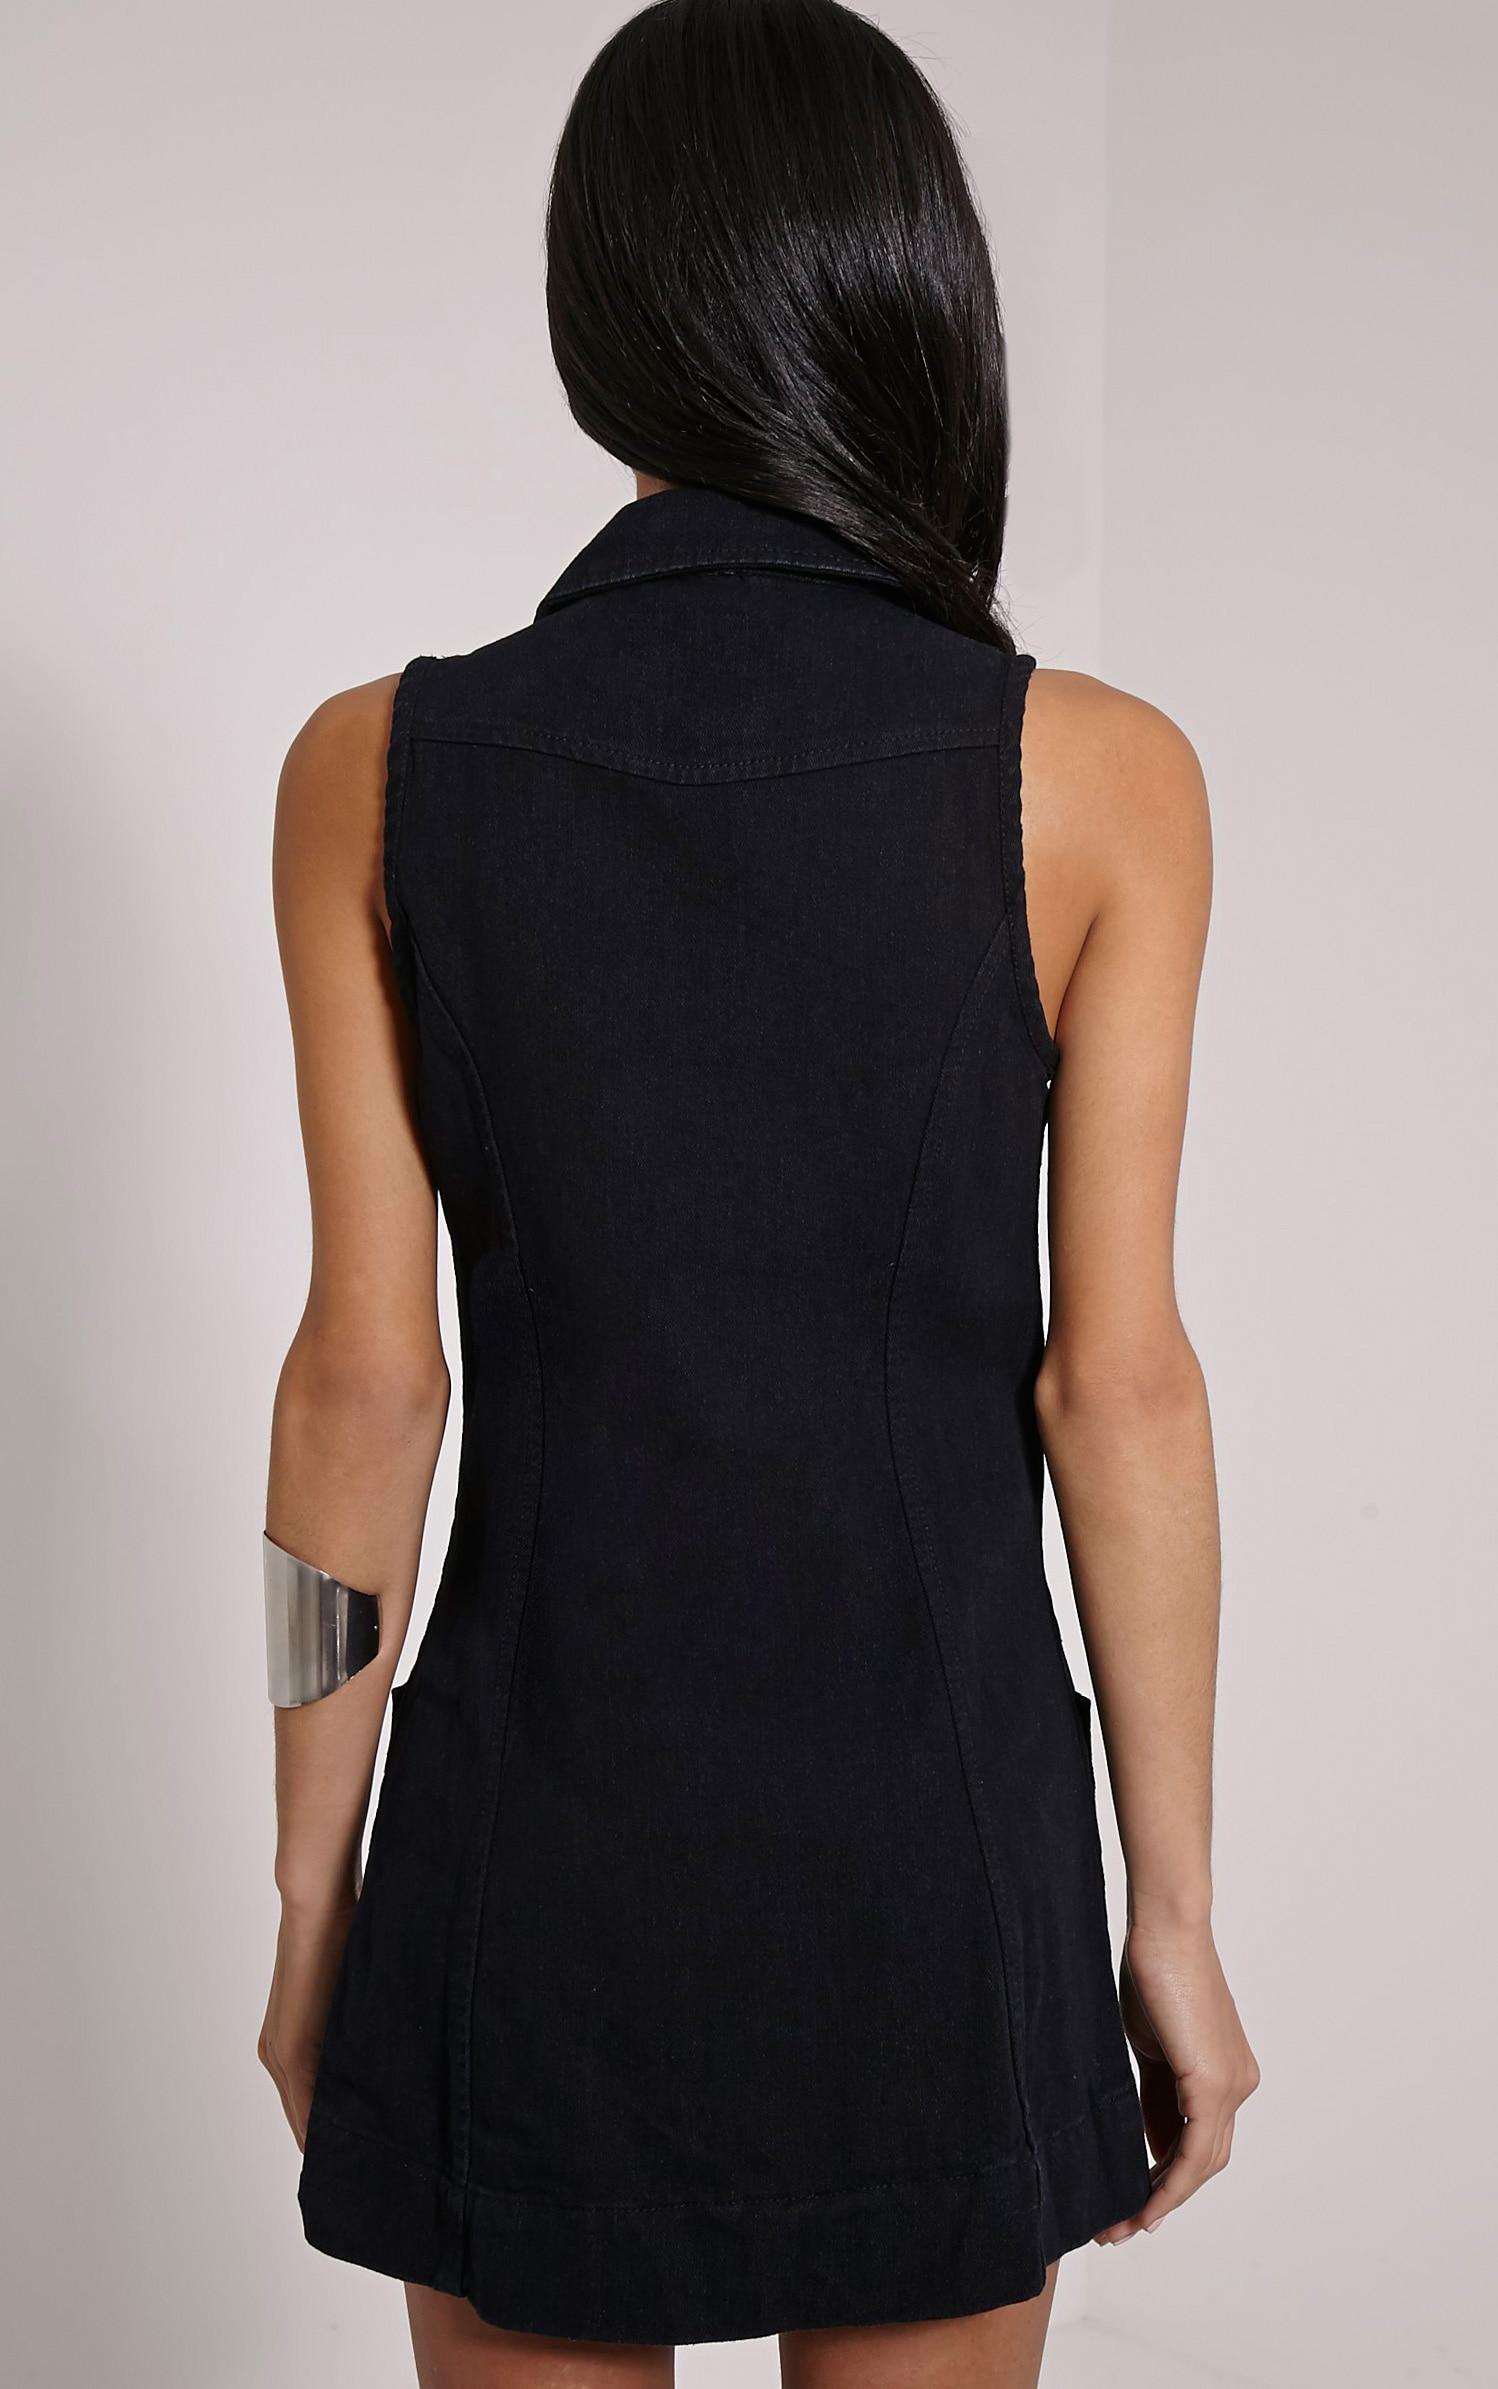 Moxie Black Zip Front Denim Dress 2